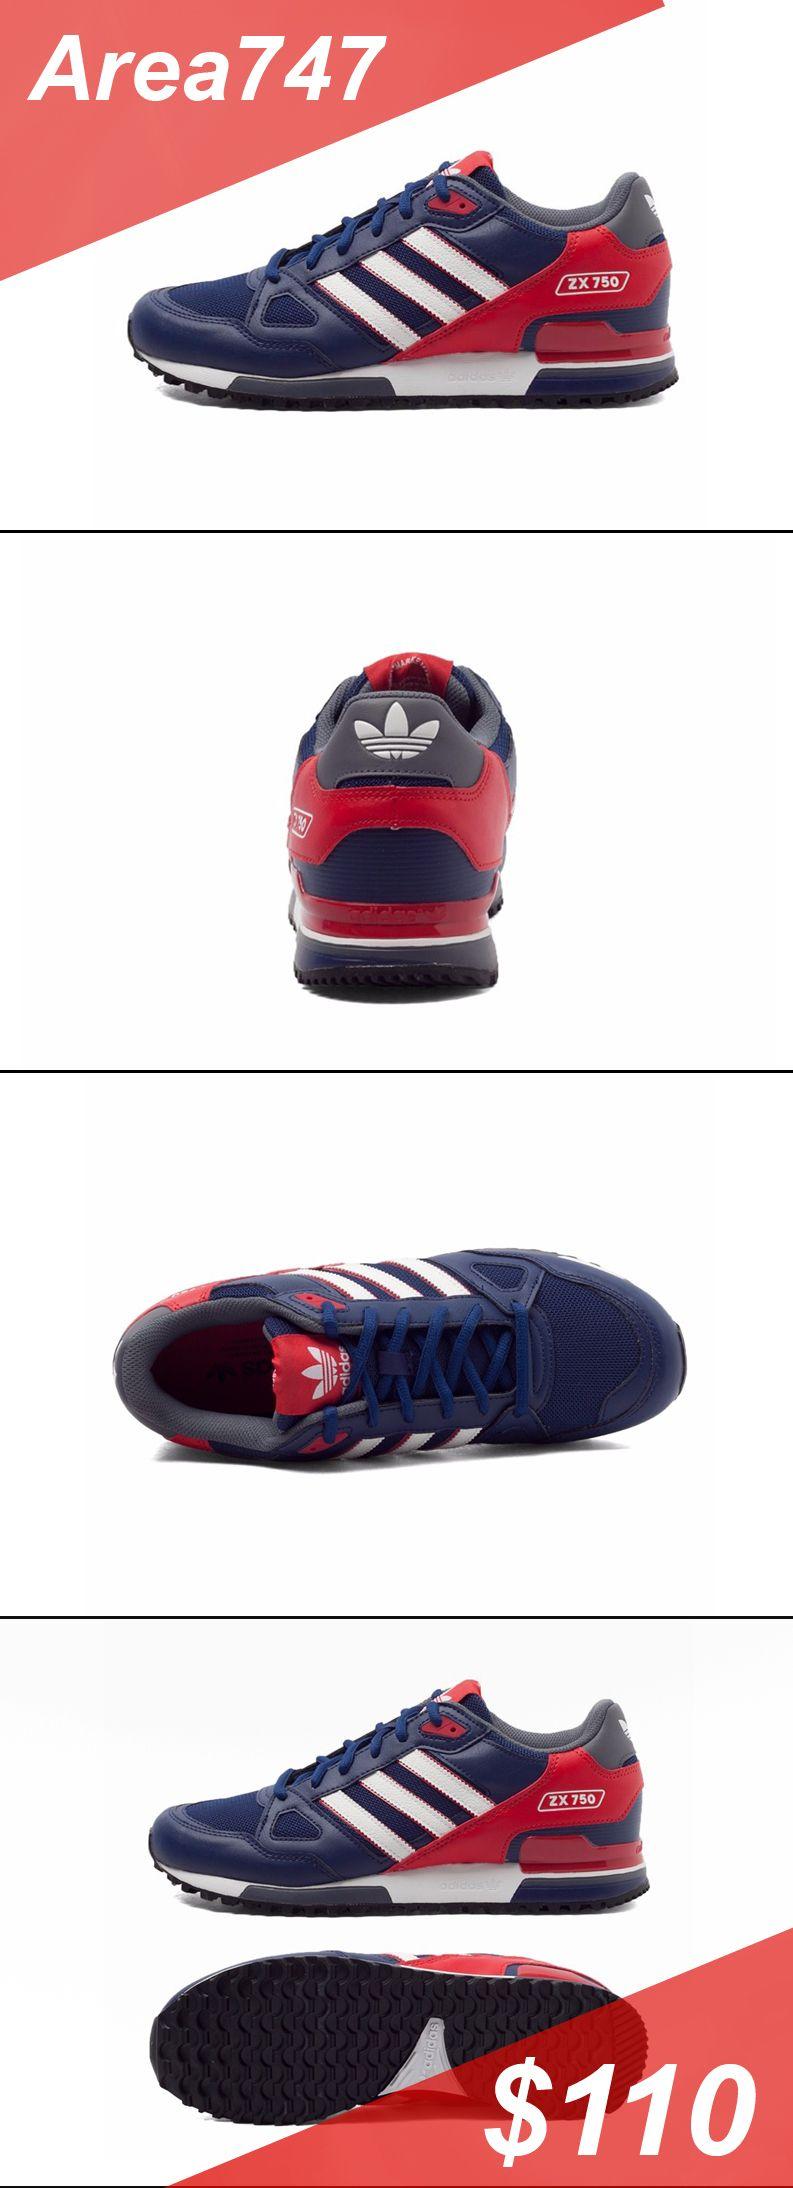 adidas zx 750 aliexpress